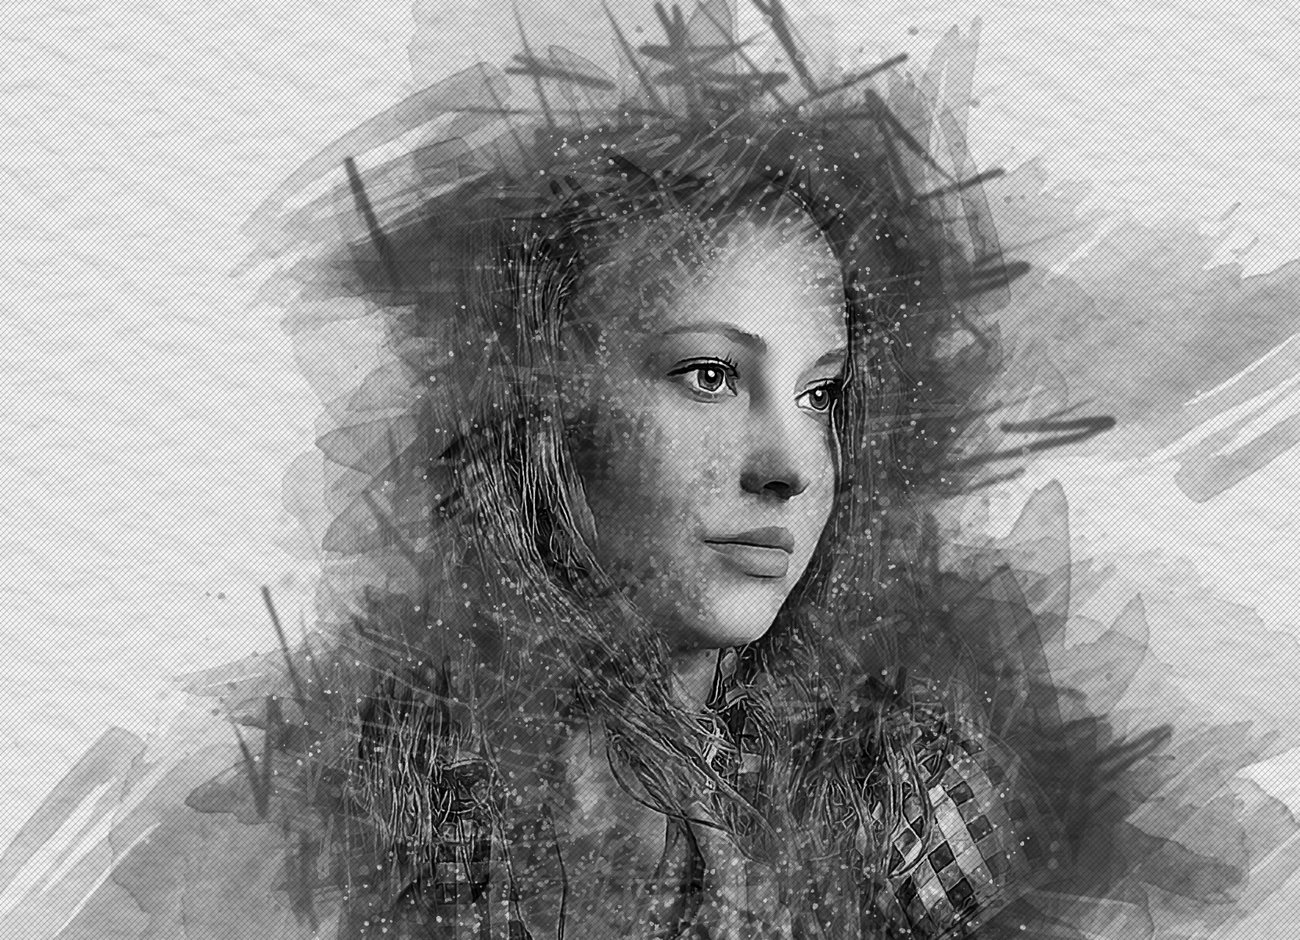 逼真水彩画效果照片处理特效PS动作模板 Watercolor Photoshop Action插图4